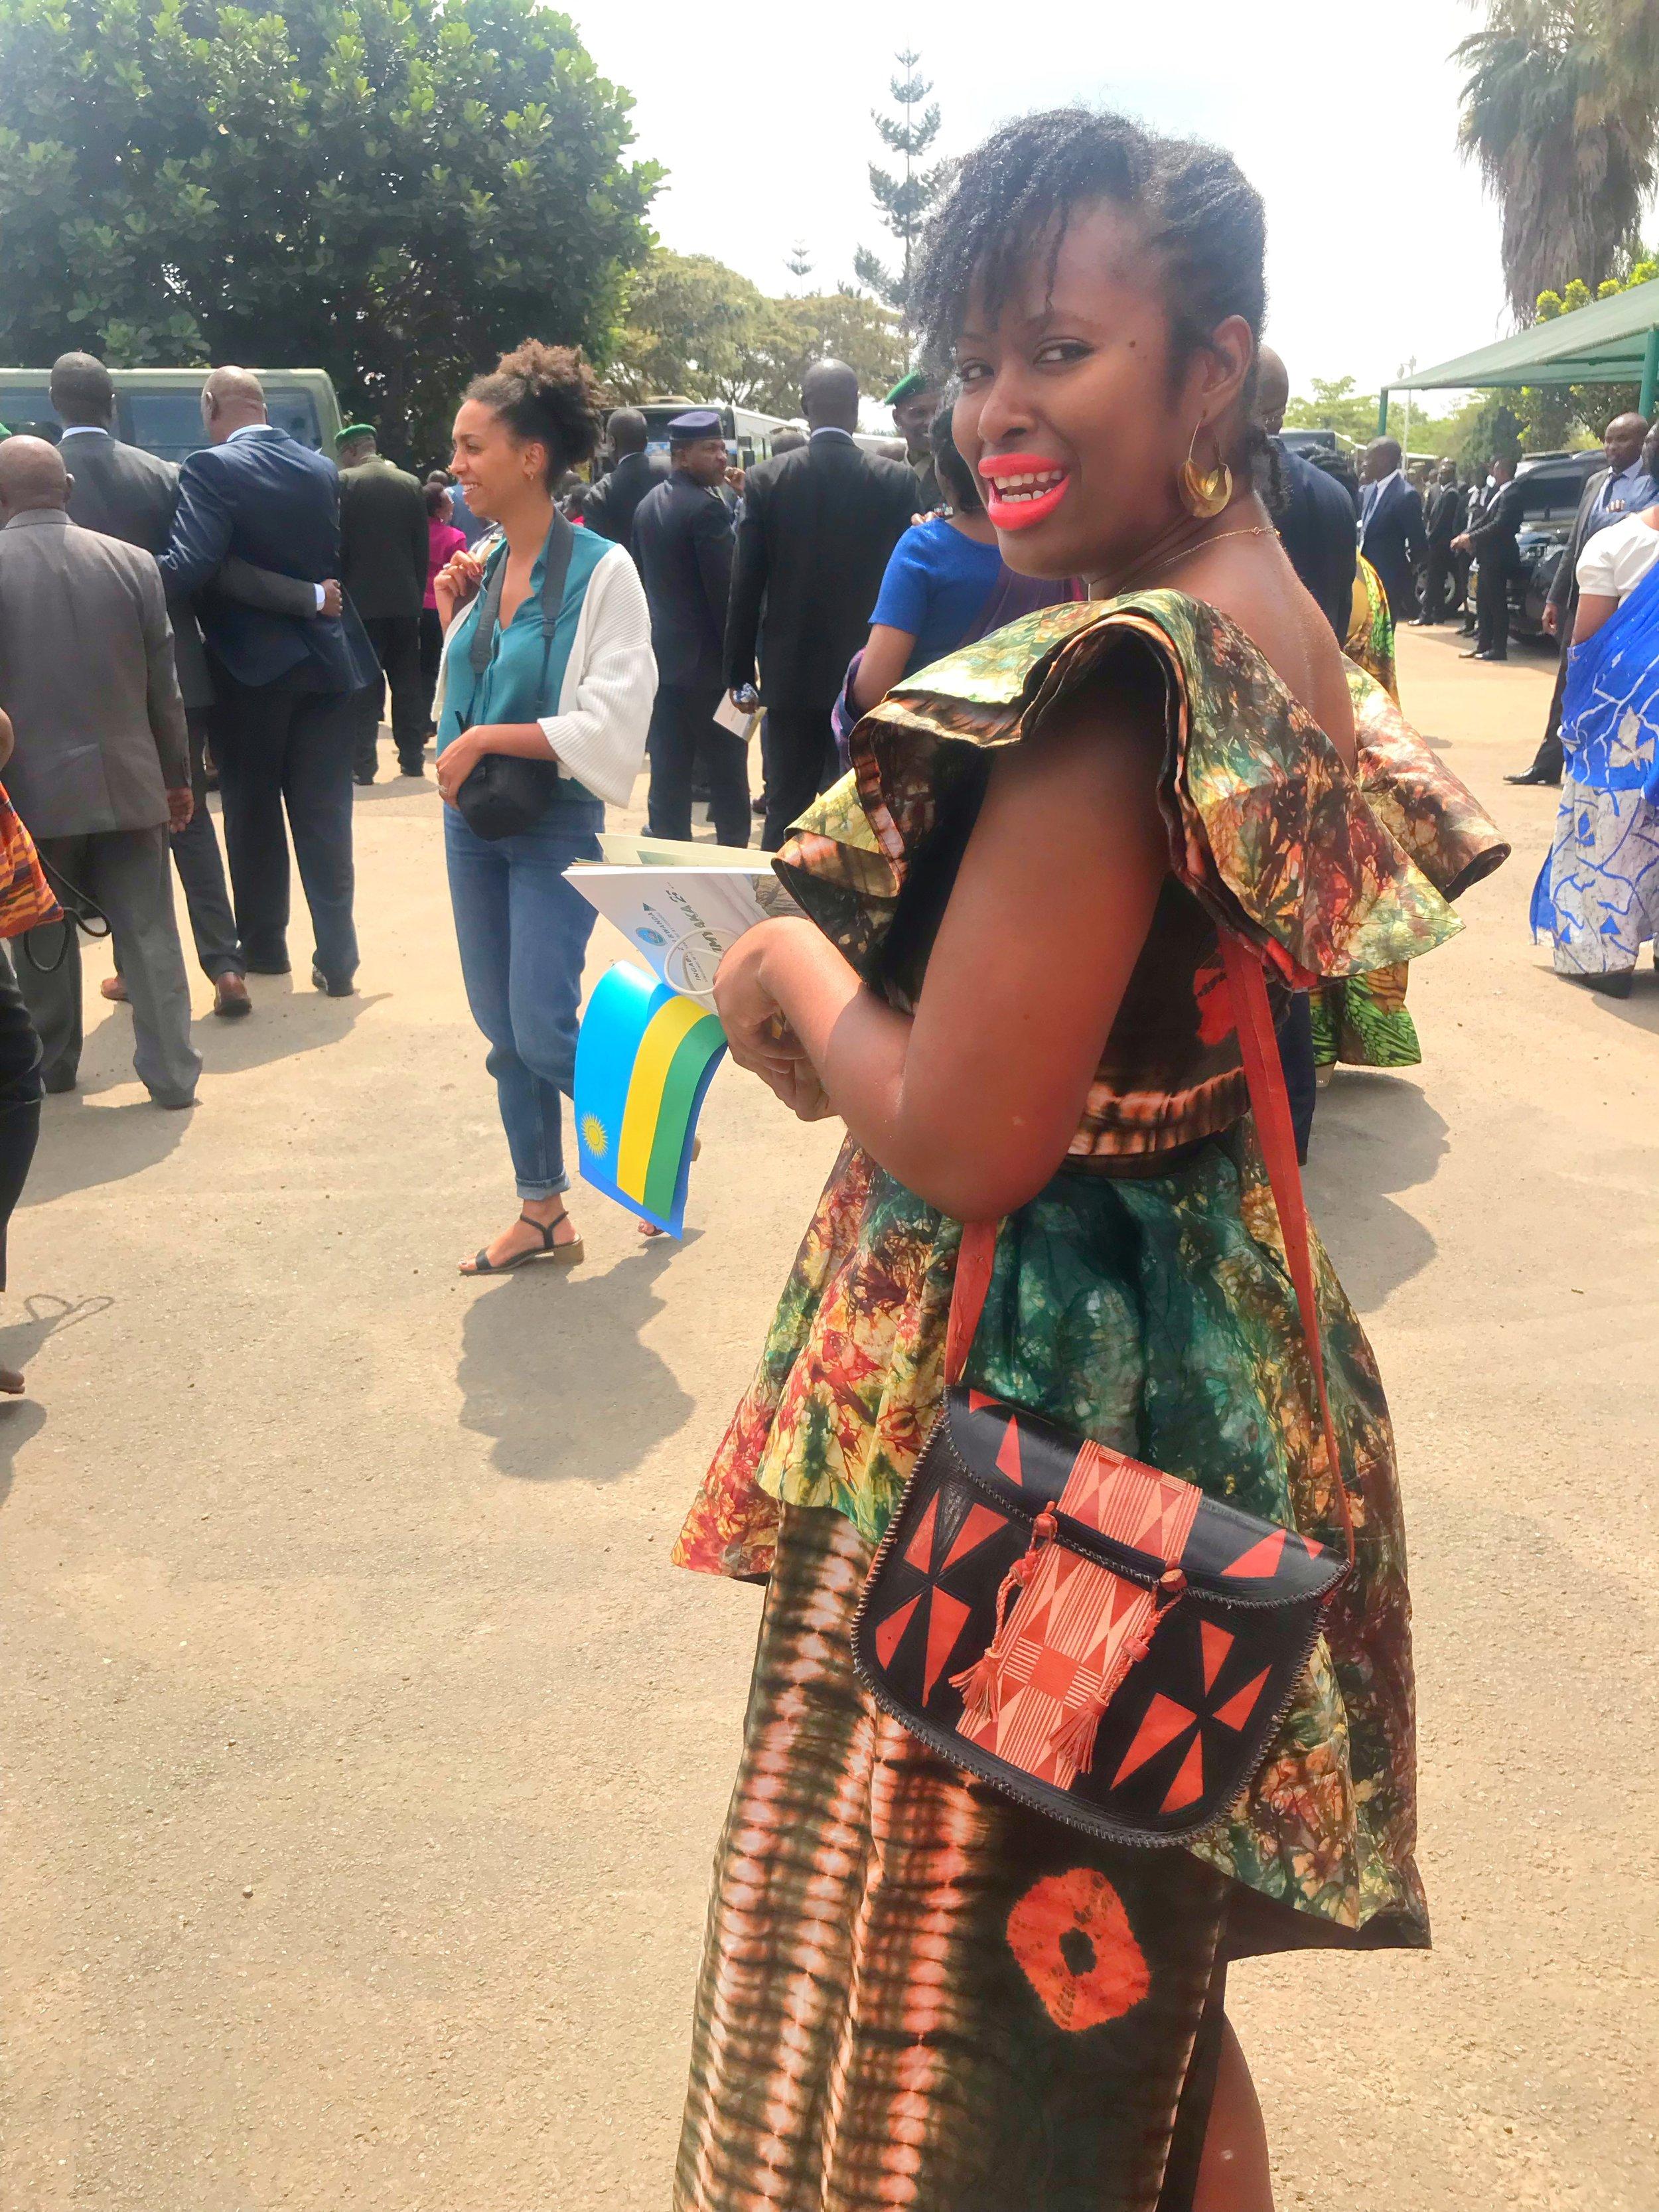 IMG_5859_Facetune_04-07-2019-21-15-40VickieRemoe-travel-kigali-rwanda-review-kwibohora25-hotels-africa.JPG